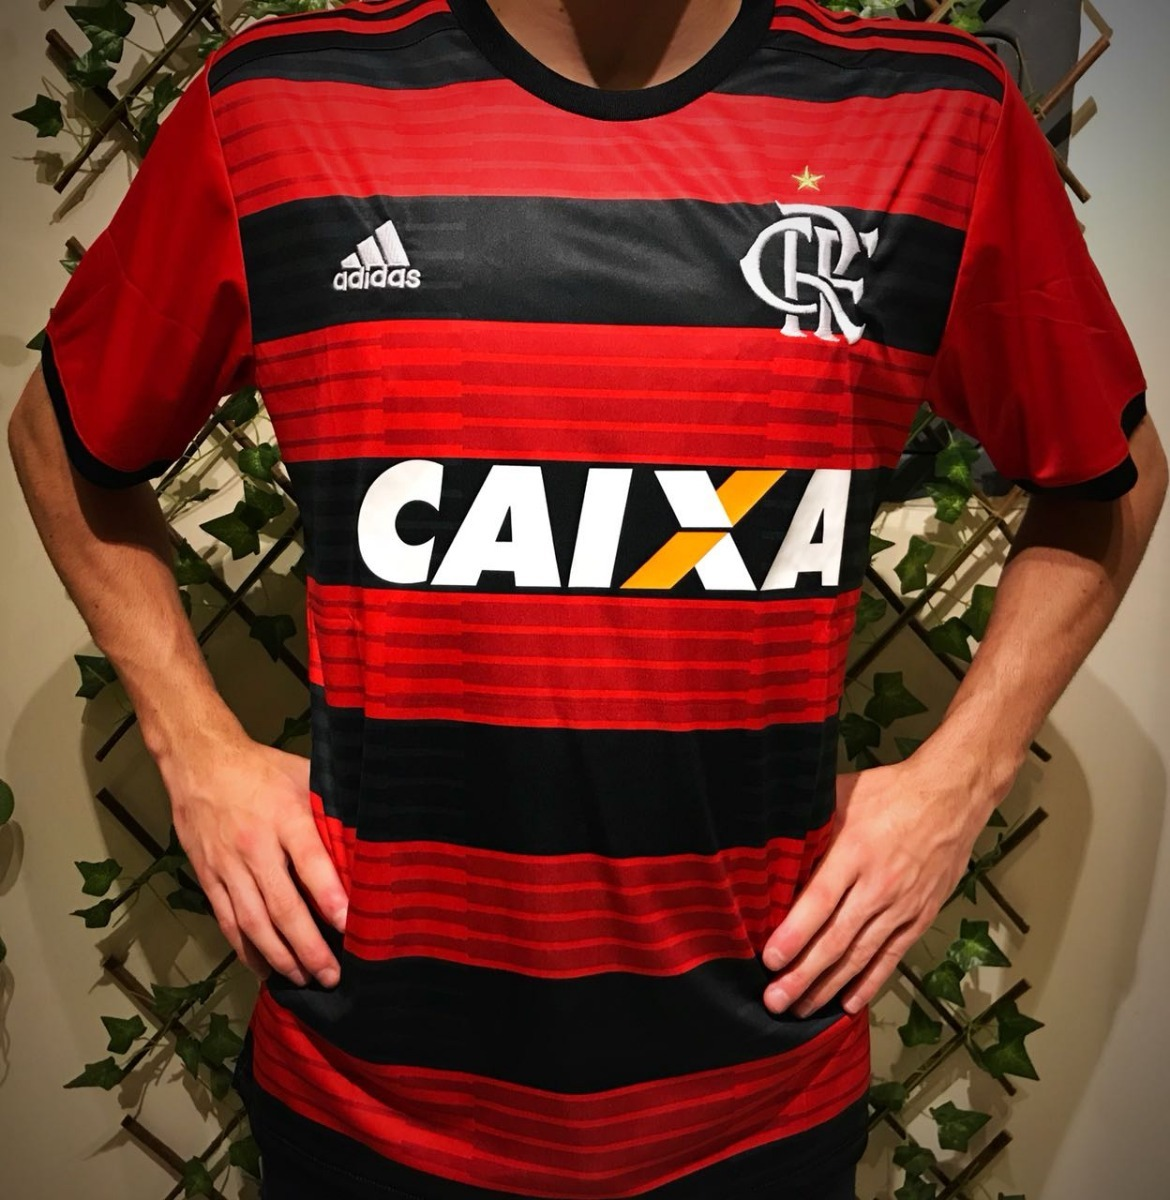 97ee5cf2e4 ... camiseta flamengo s patrocínio torcedor vermelha s n° home. Carregando  zoom. beb170beb67ddb ...